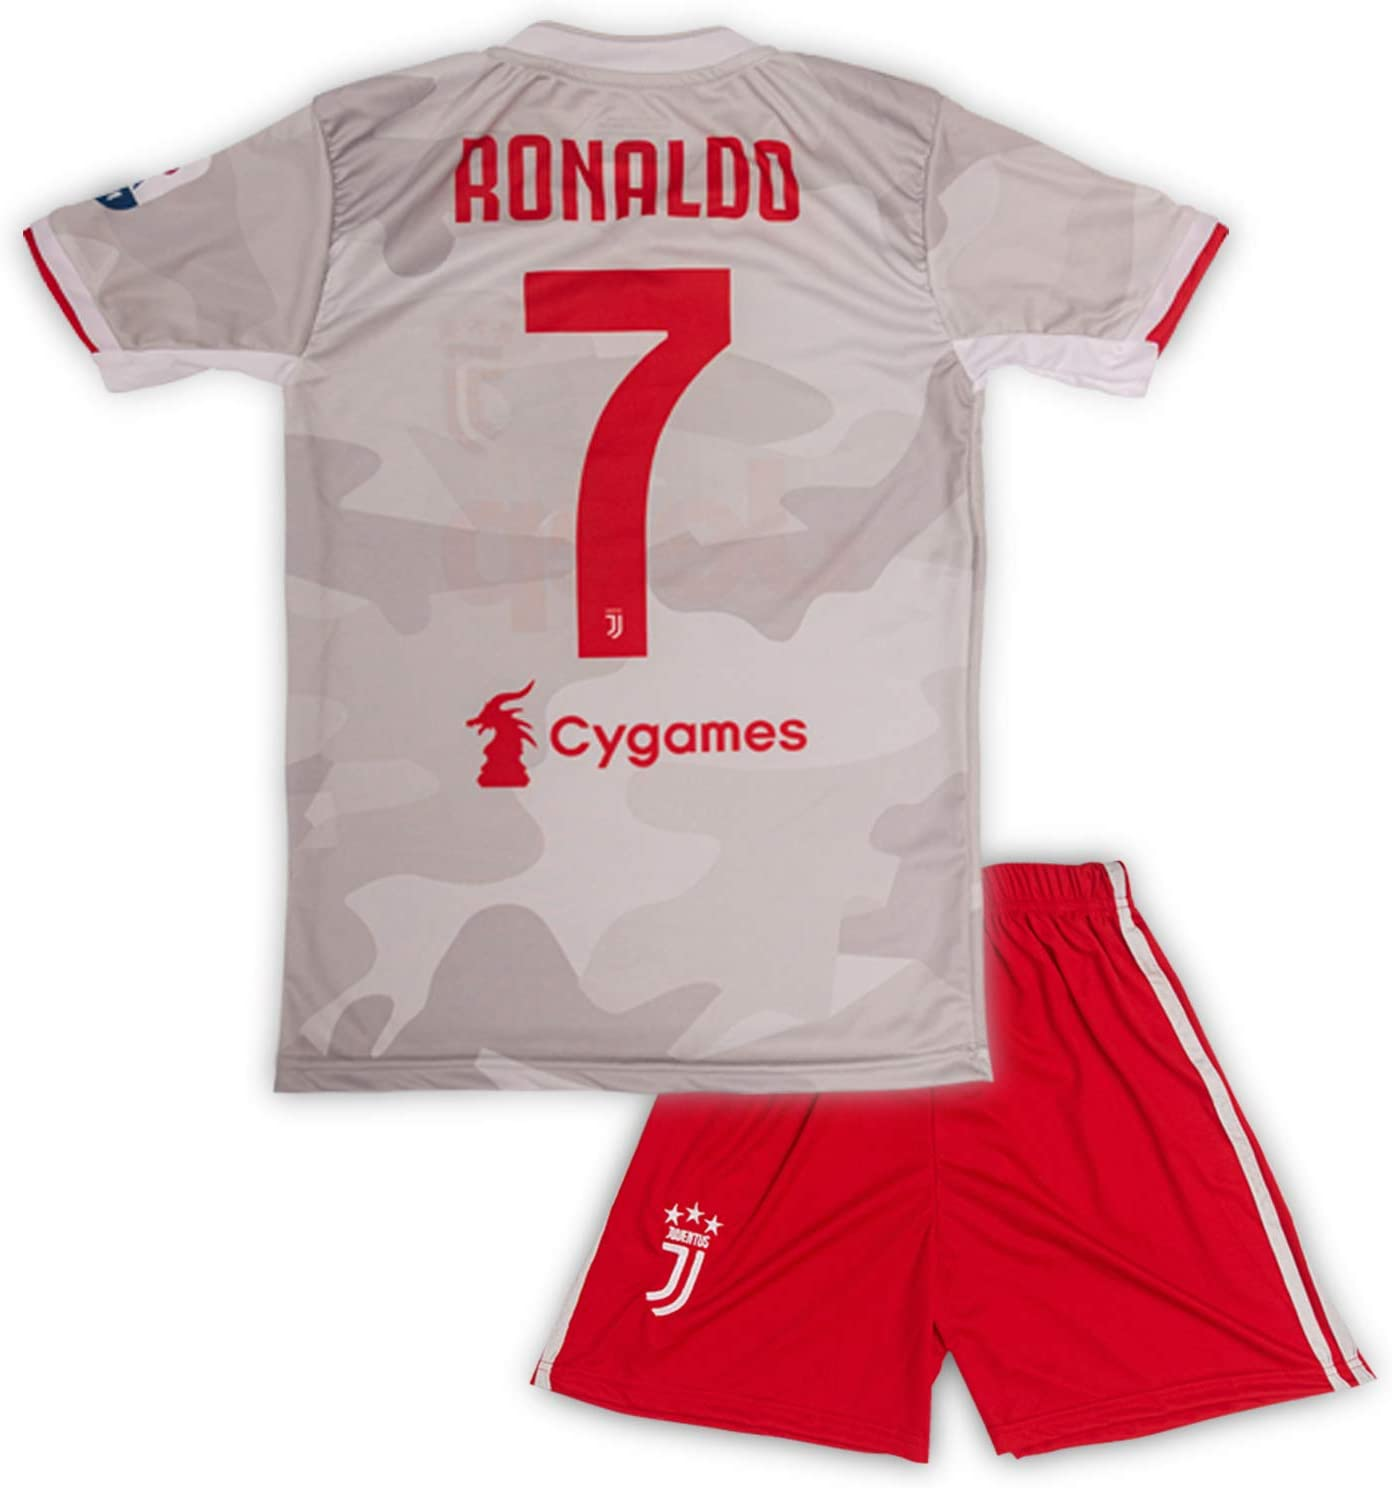 Juventus #7 Cristiano Ronaldo Trikot Set 2019-2020 Ausw/ärts Kinder Fu/ßball Trikot mit Shorts und Socken Kindergr/ö/ßen